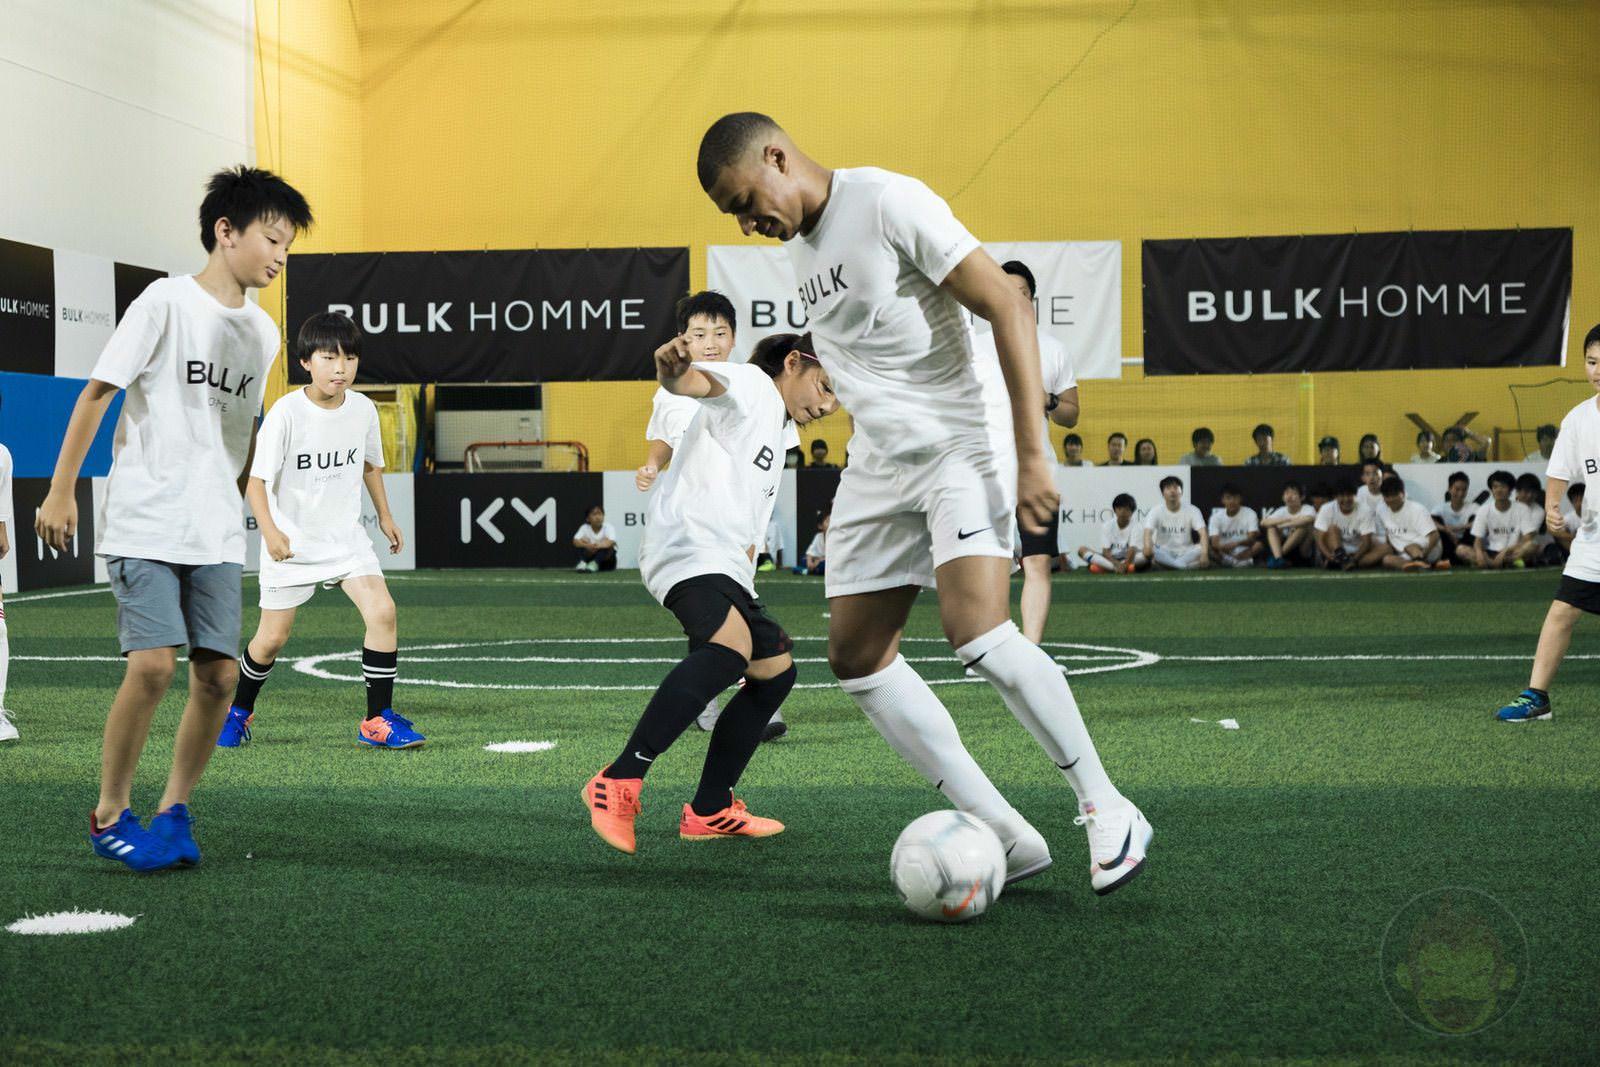 Kylian Mbappé plays soccer with kids 14